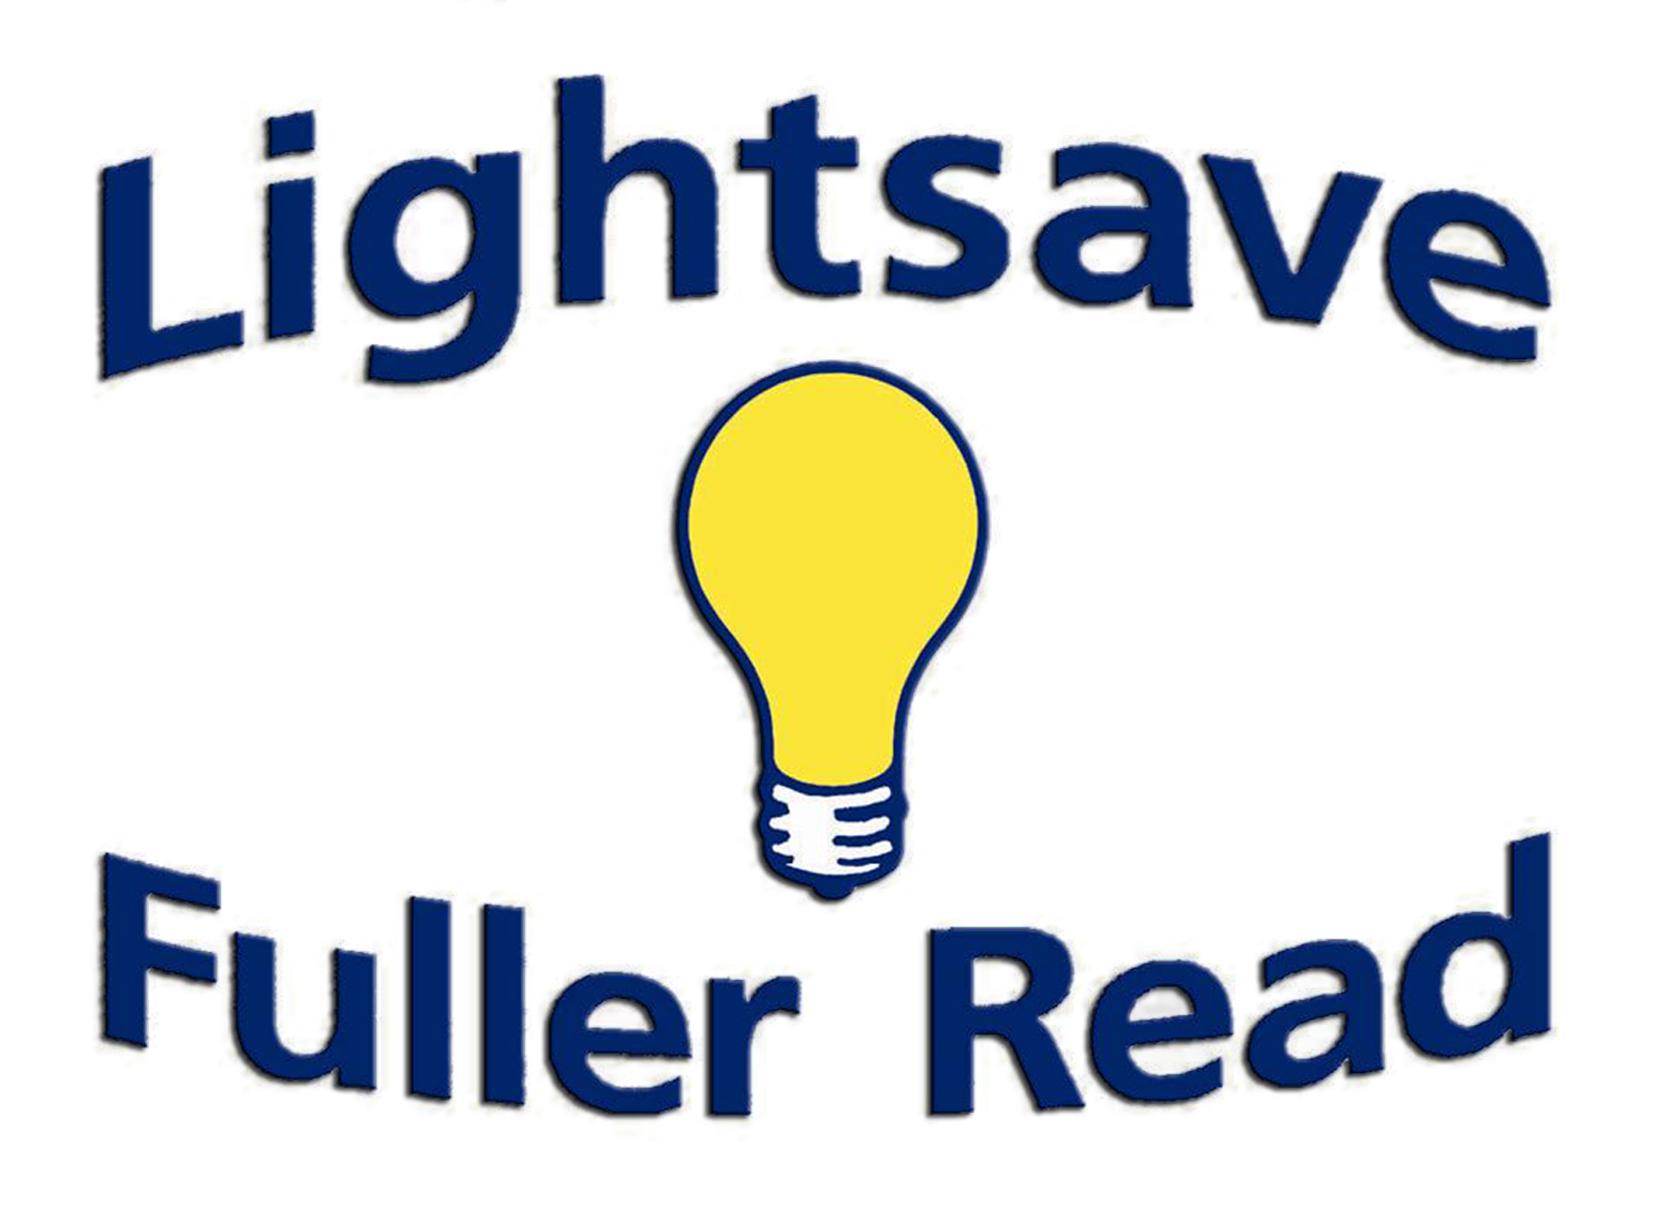 lightsave_rebrand_old_logo